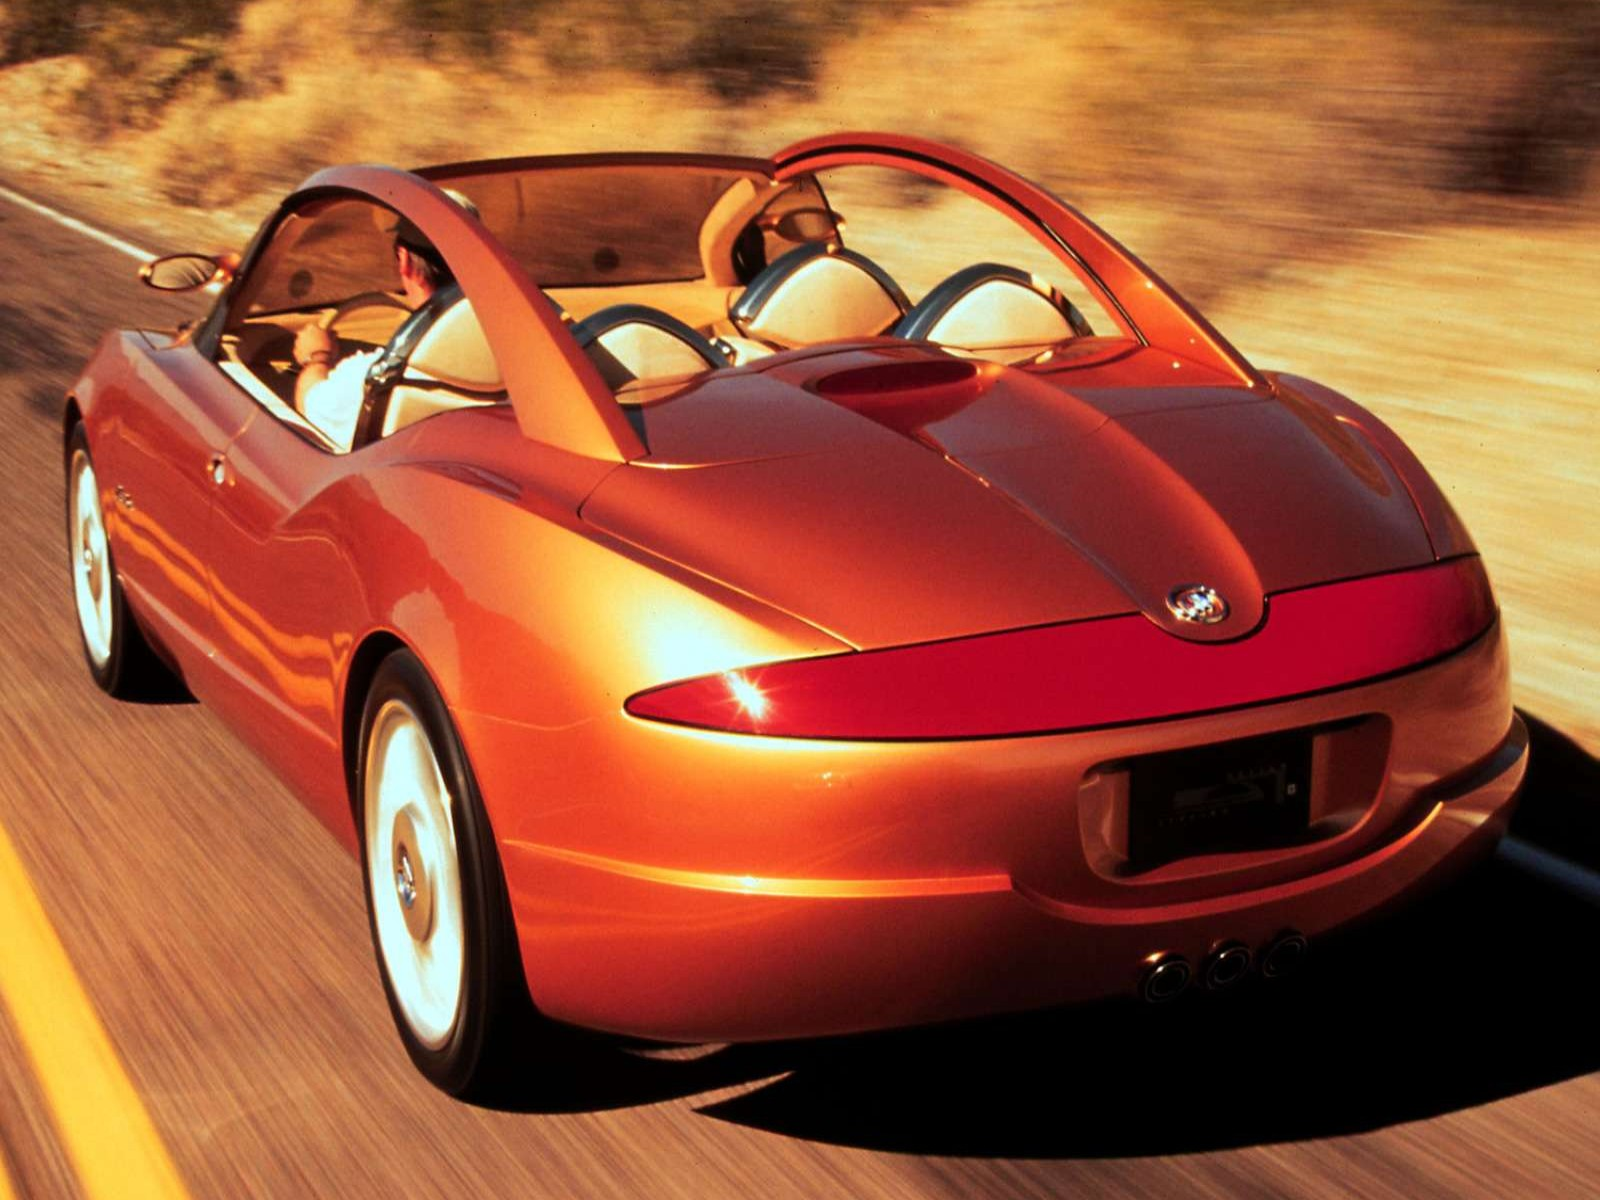 http://2.bp.blogspot.com/-jvq4k7Kc33Q/TqHGNKN5YSI/AAAAAAAAAUQ/VLjXjtGs4vA/s1600/Buick+Cielo+Concept+1999+04.jpg